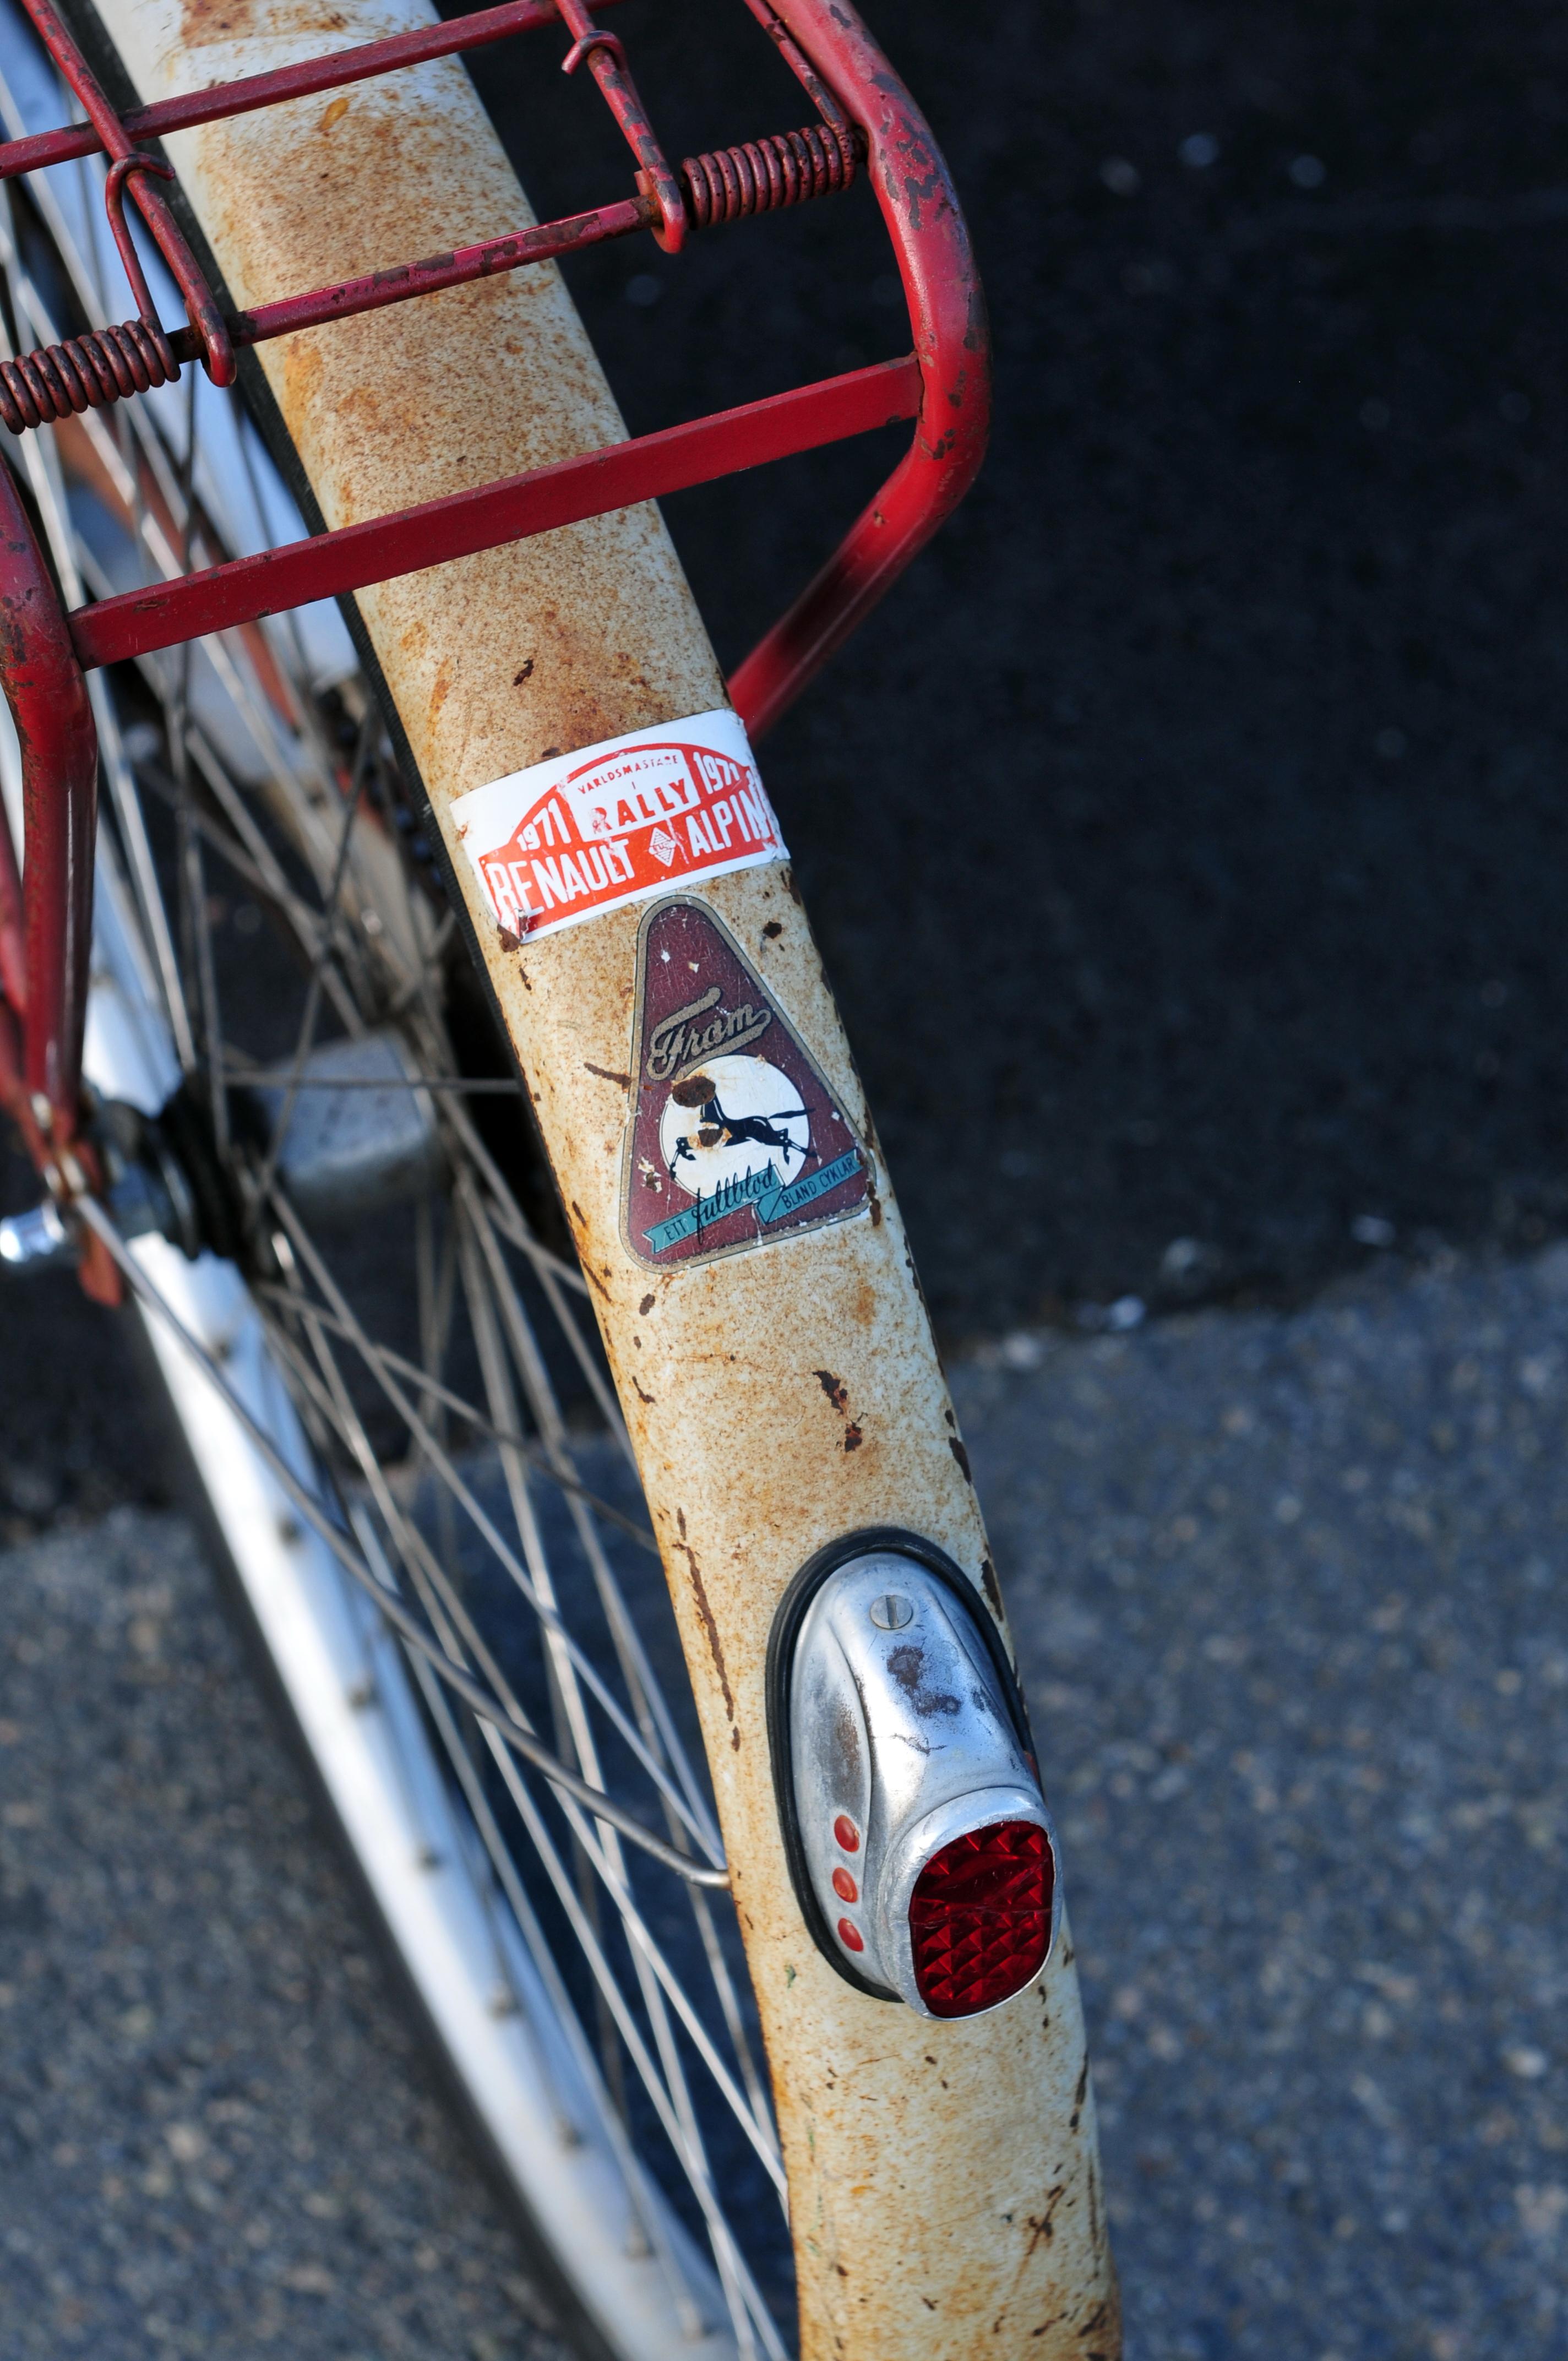 14-09-02-fahrrad-oslo-18.jpg